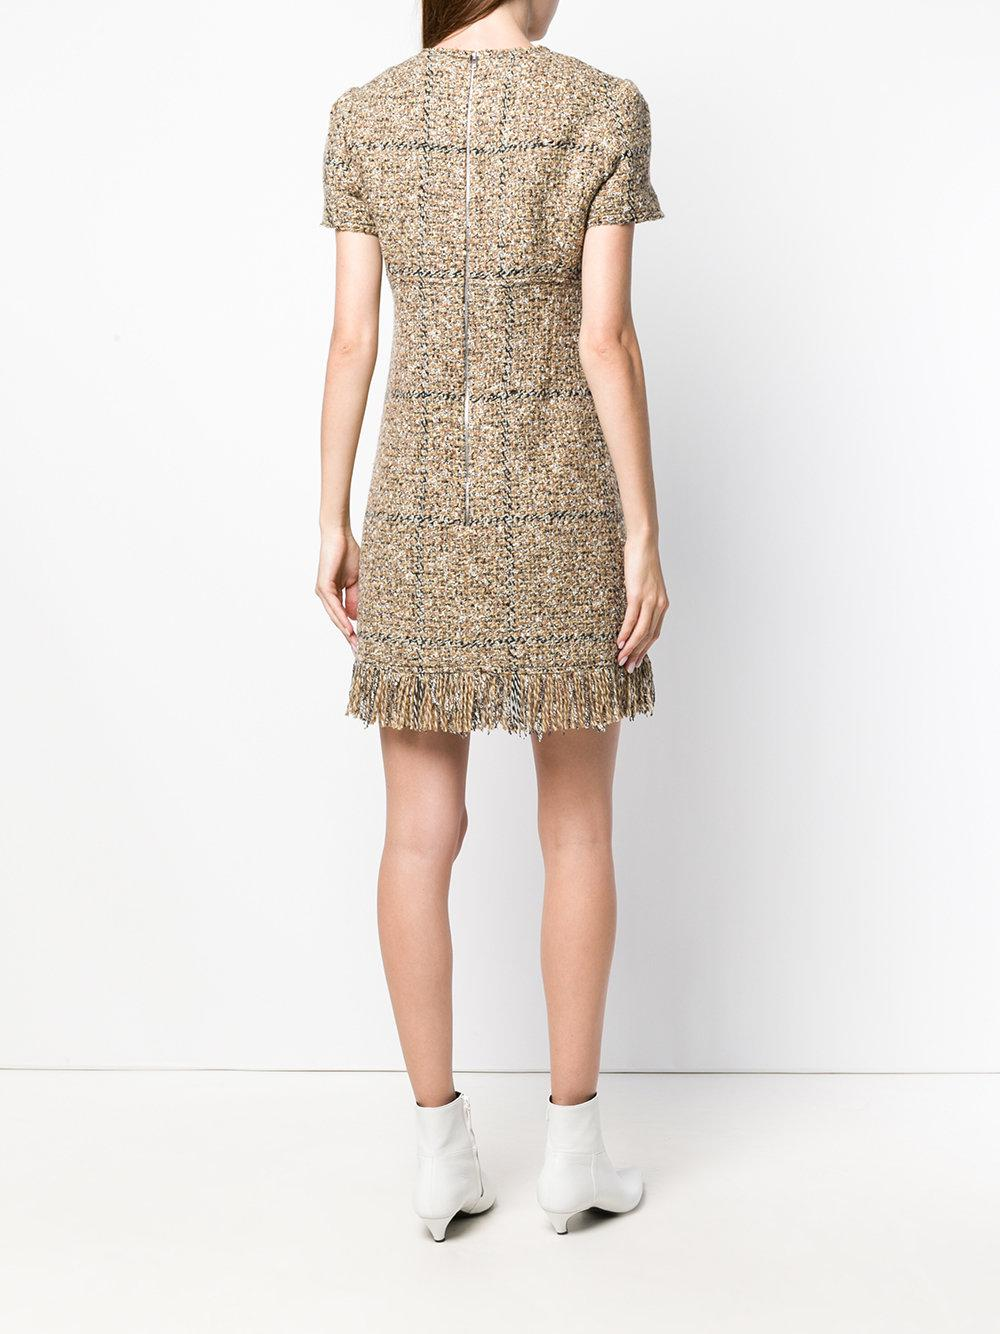 3f4275eacb5 Lyst - Sonia Rykiel Bouclé Mini Dress in Natural